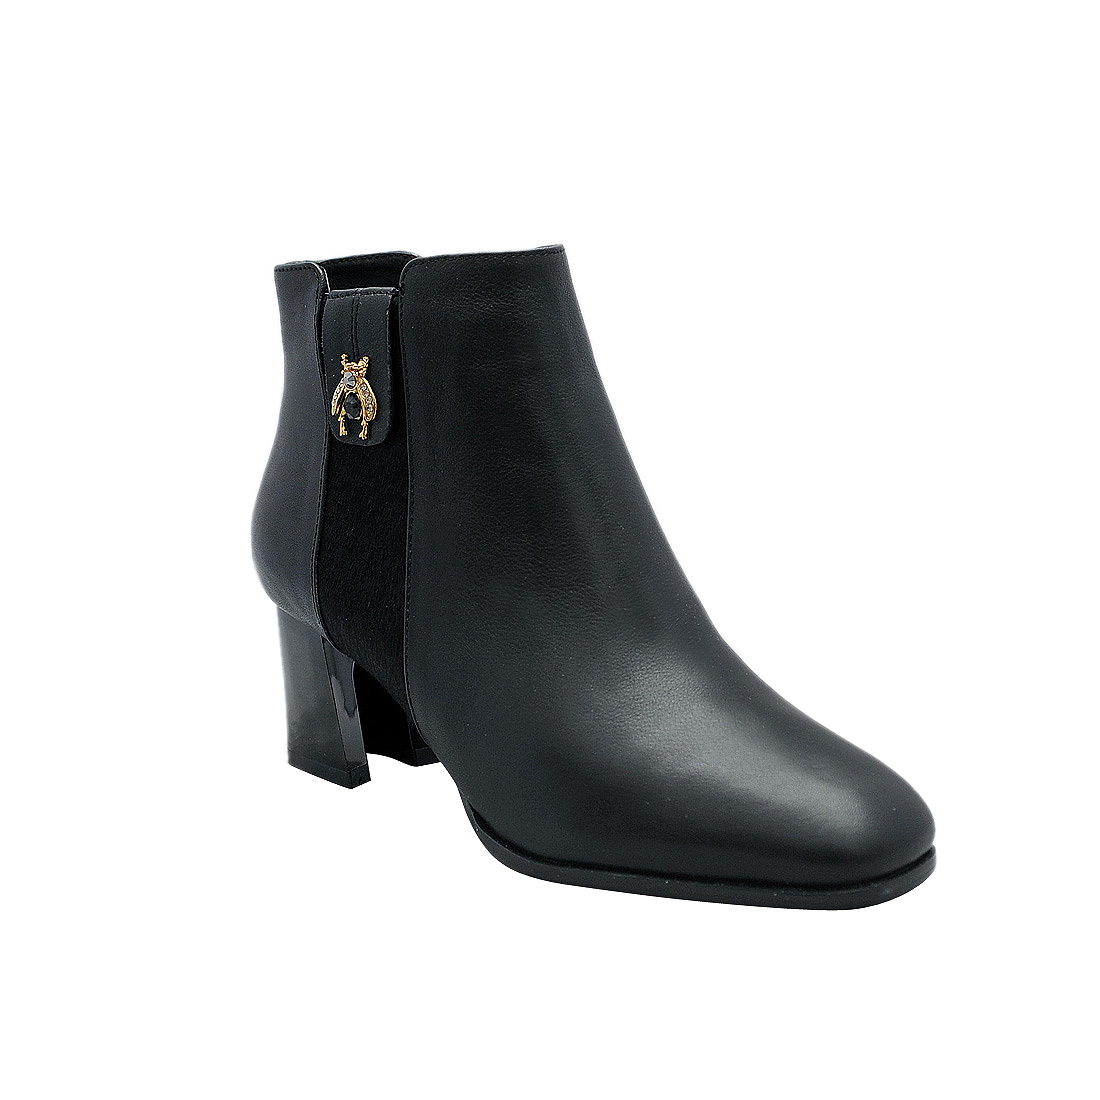 Giày bốt nữ da bò thật cao cấp ESW259